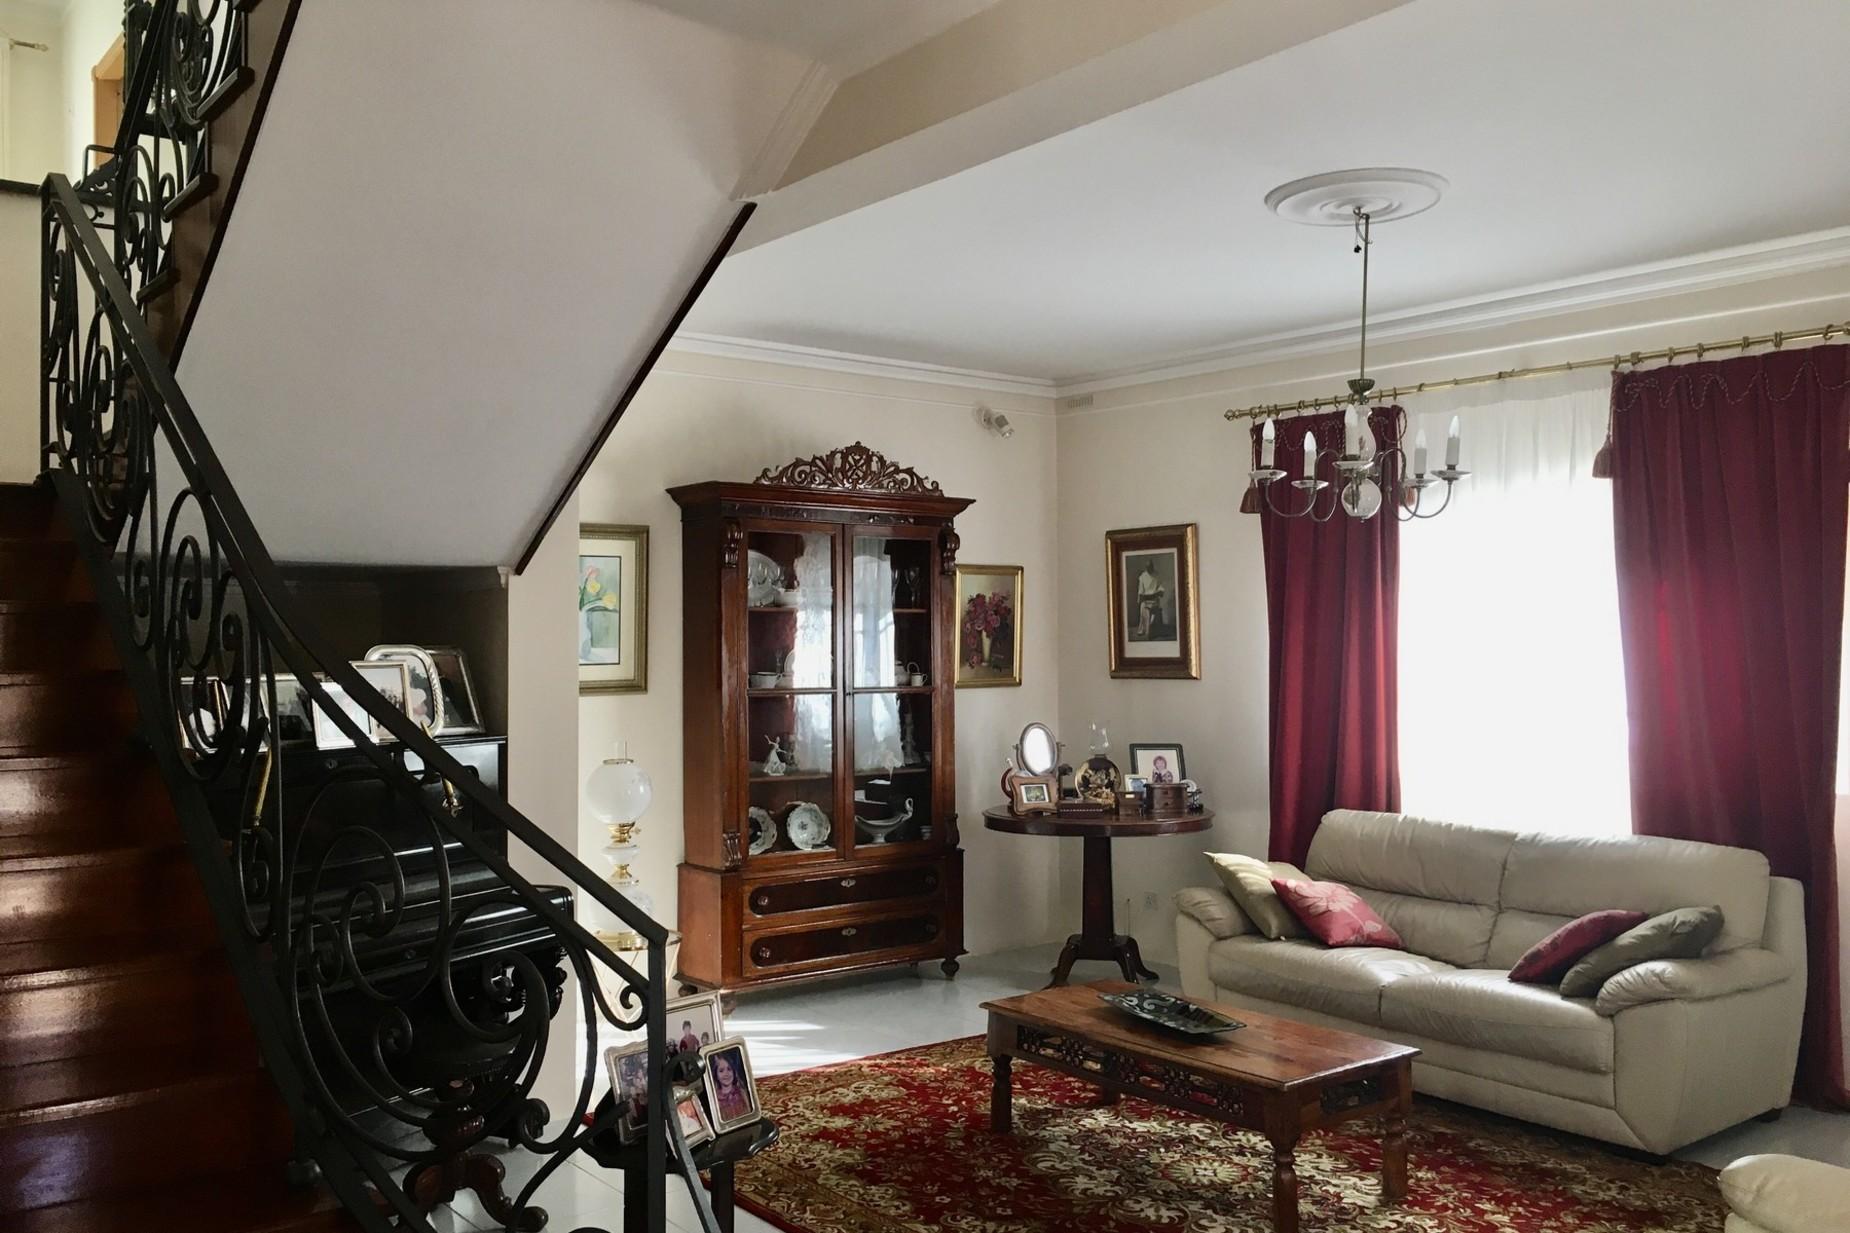 3 bed Villa For Sale in Pembroke, Pembroke - thumb 5